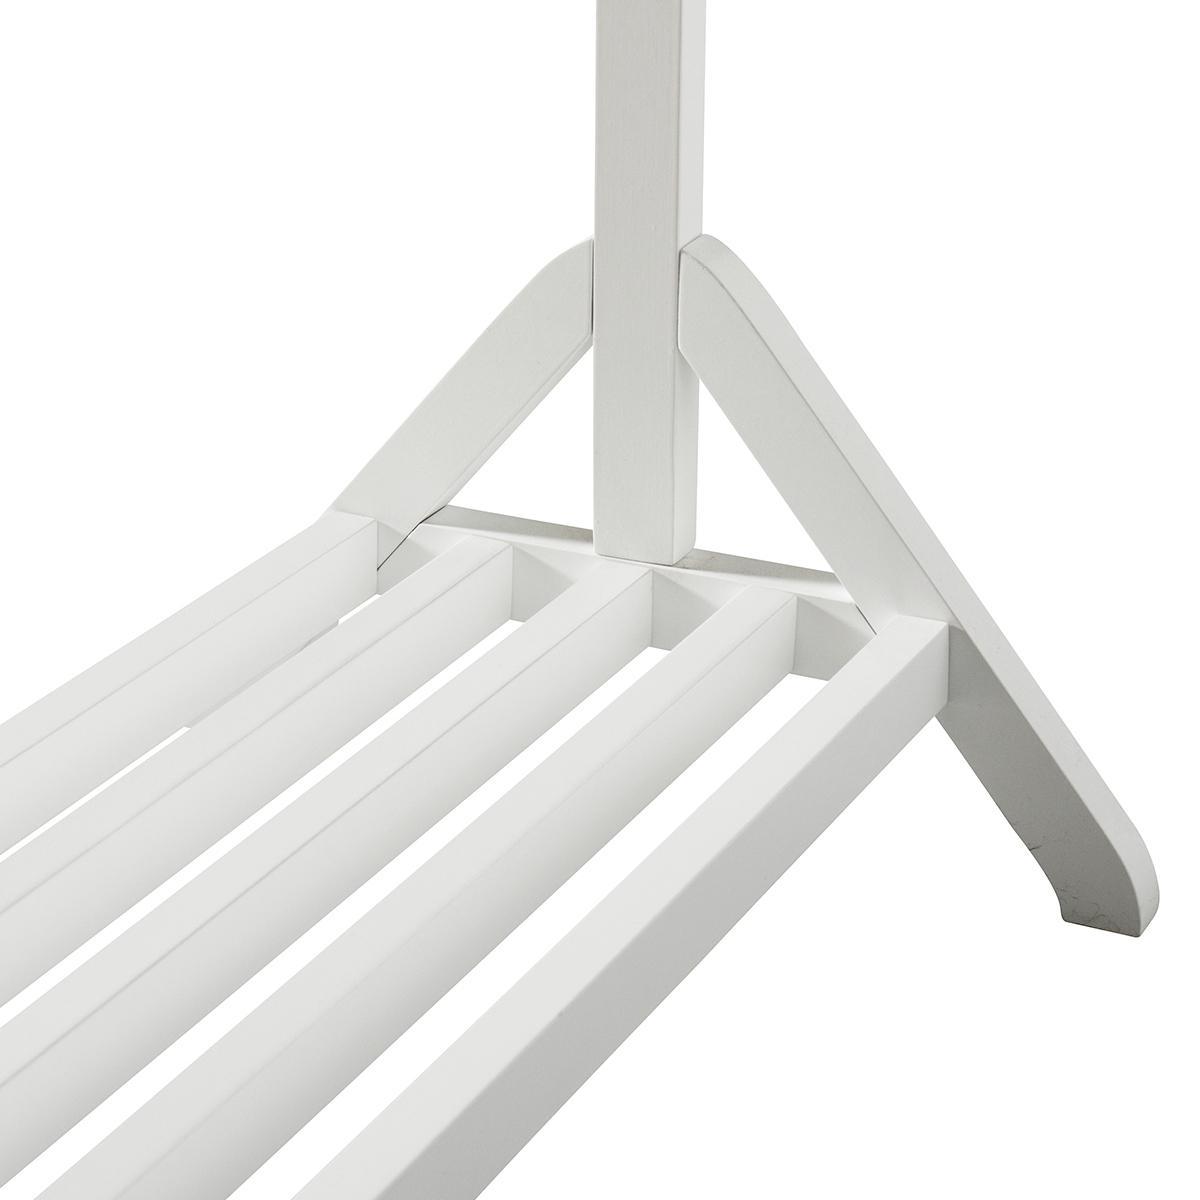 Perchero SEASIDE Oliver Furniture blanco